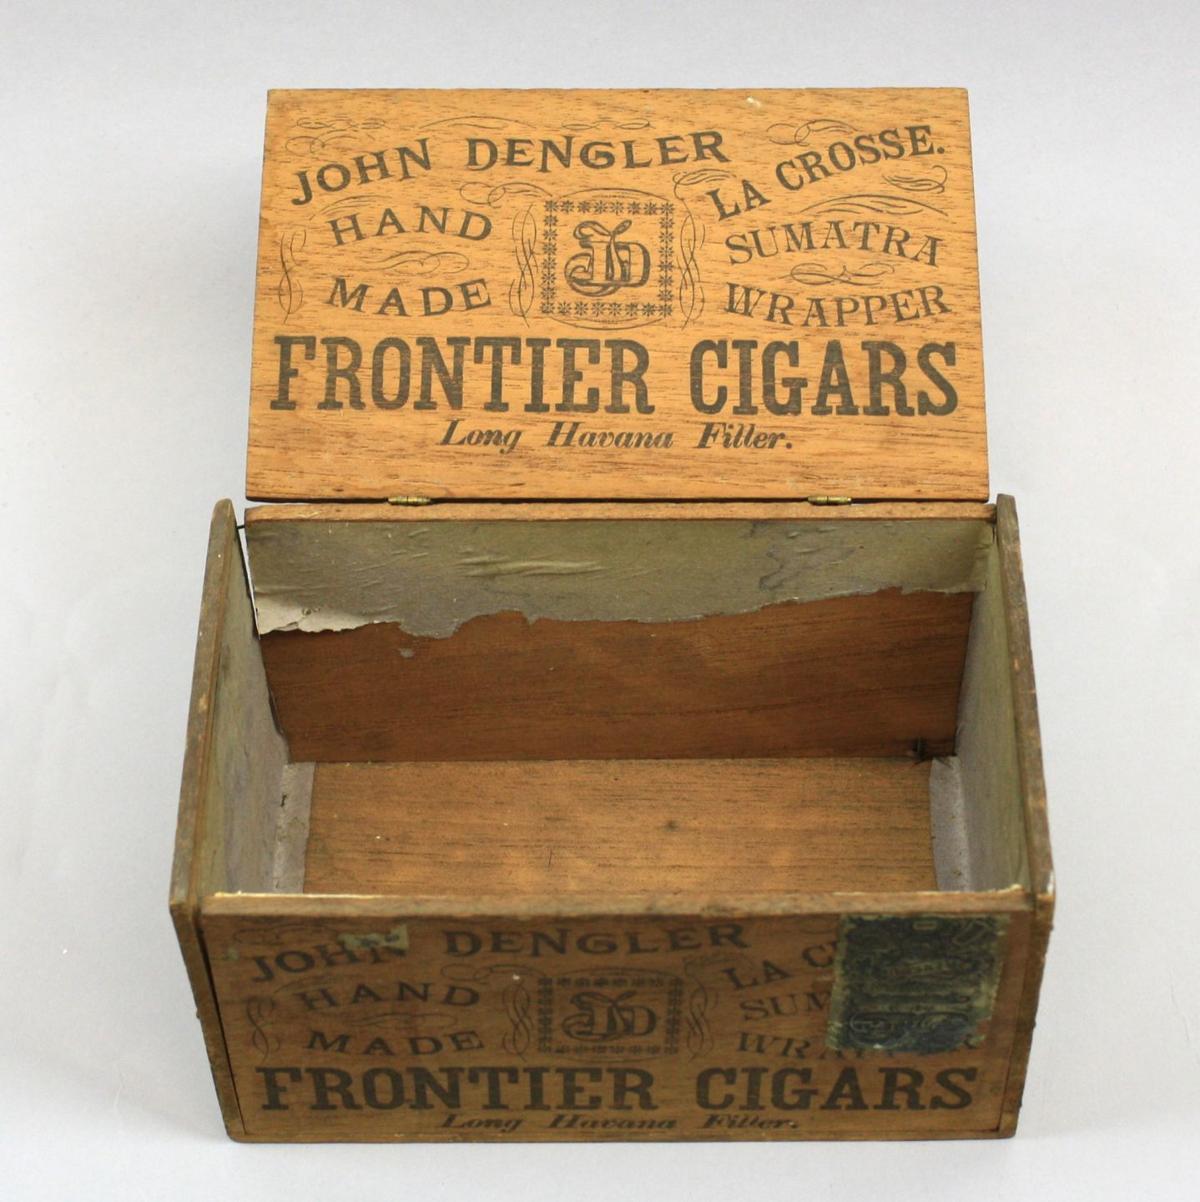 John Dengler Cigar Co. box